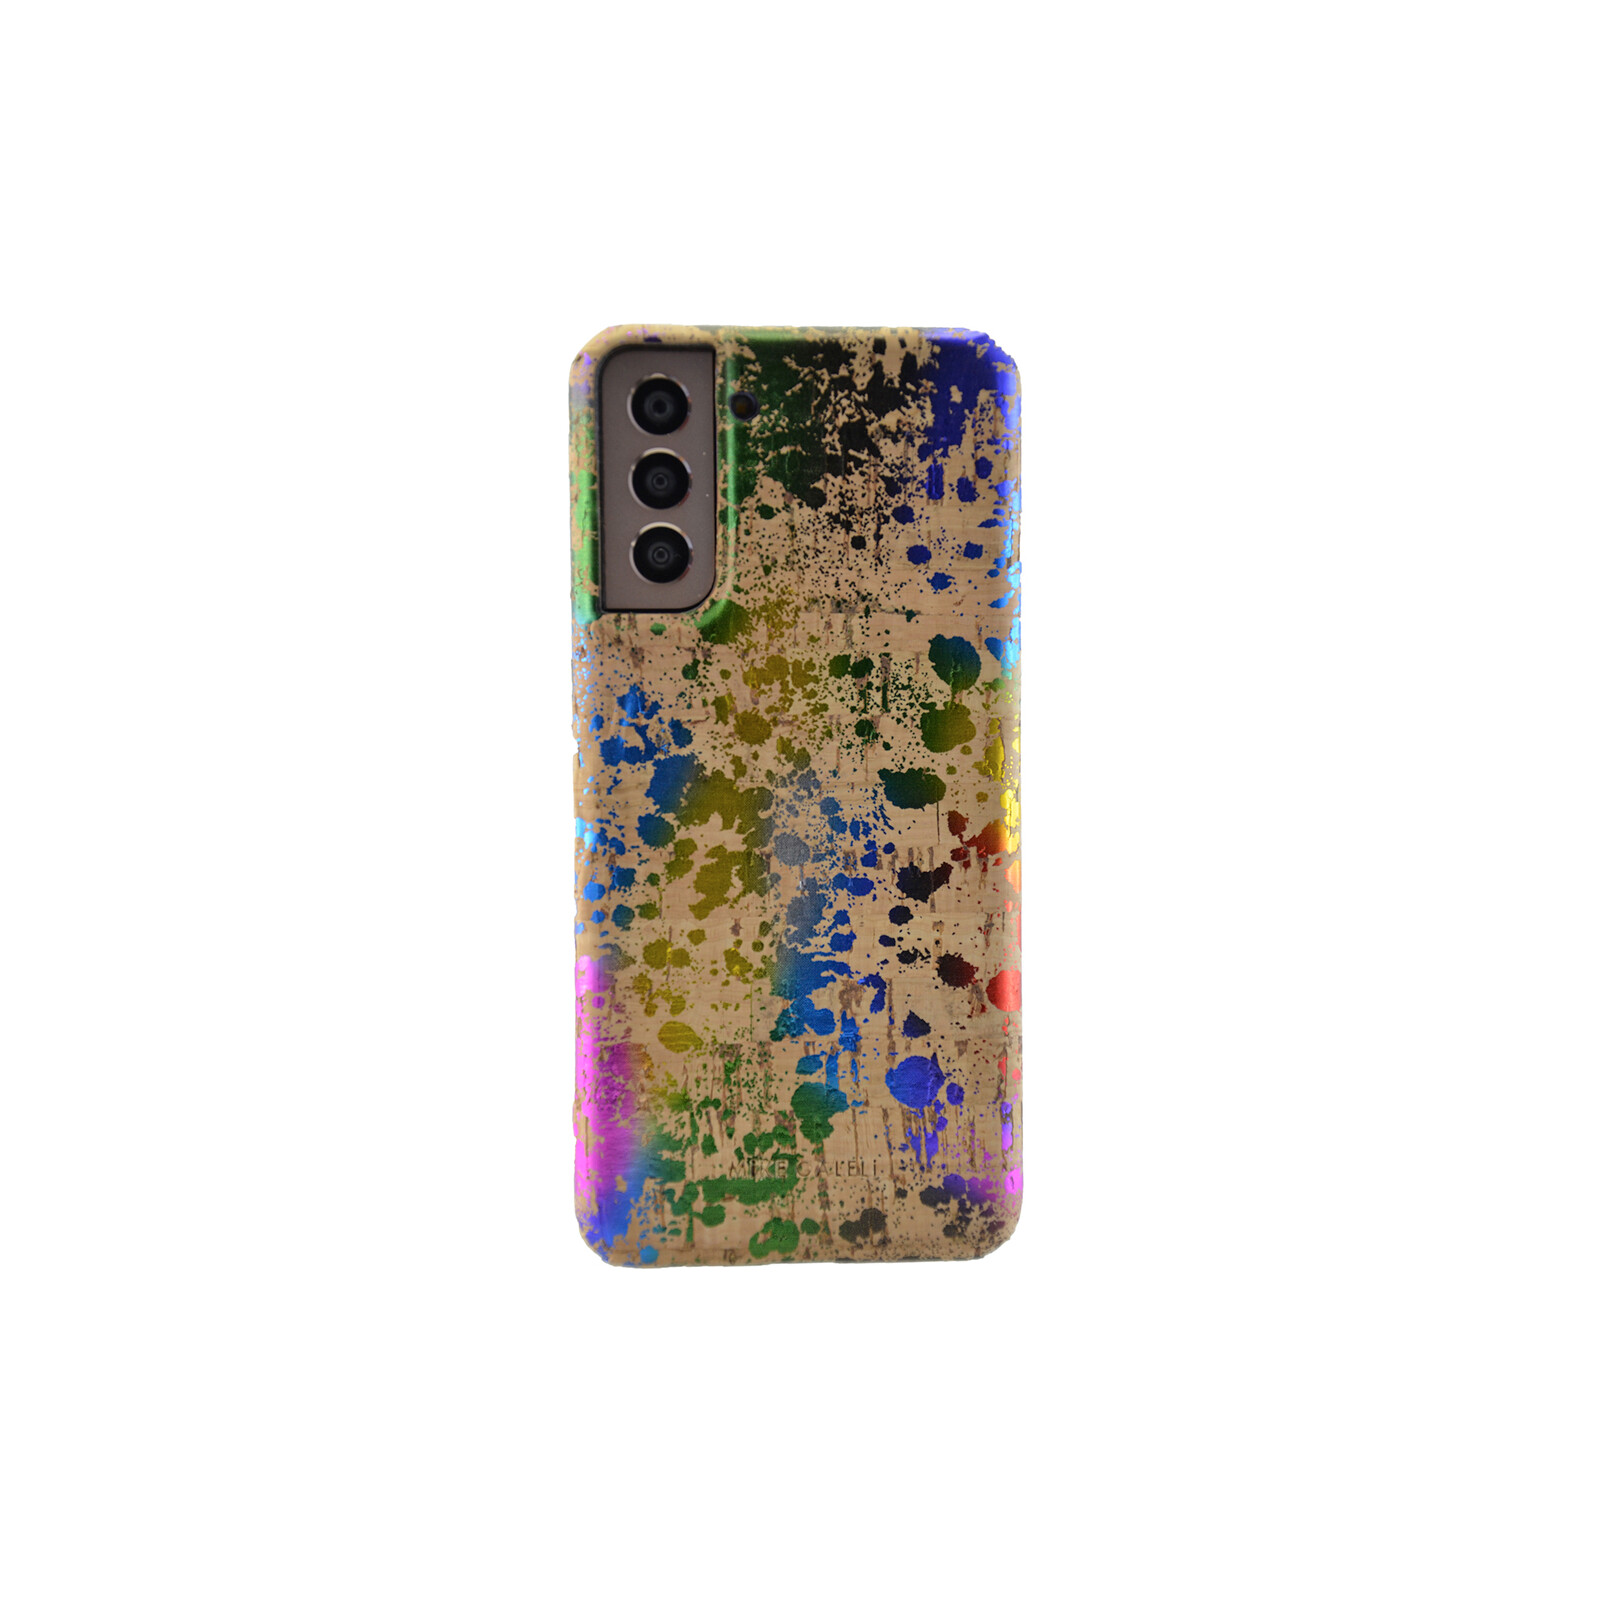 Galeli Back LEVI Cork Samsung Galaxy S21+ sprayed